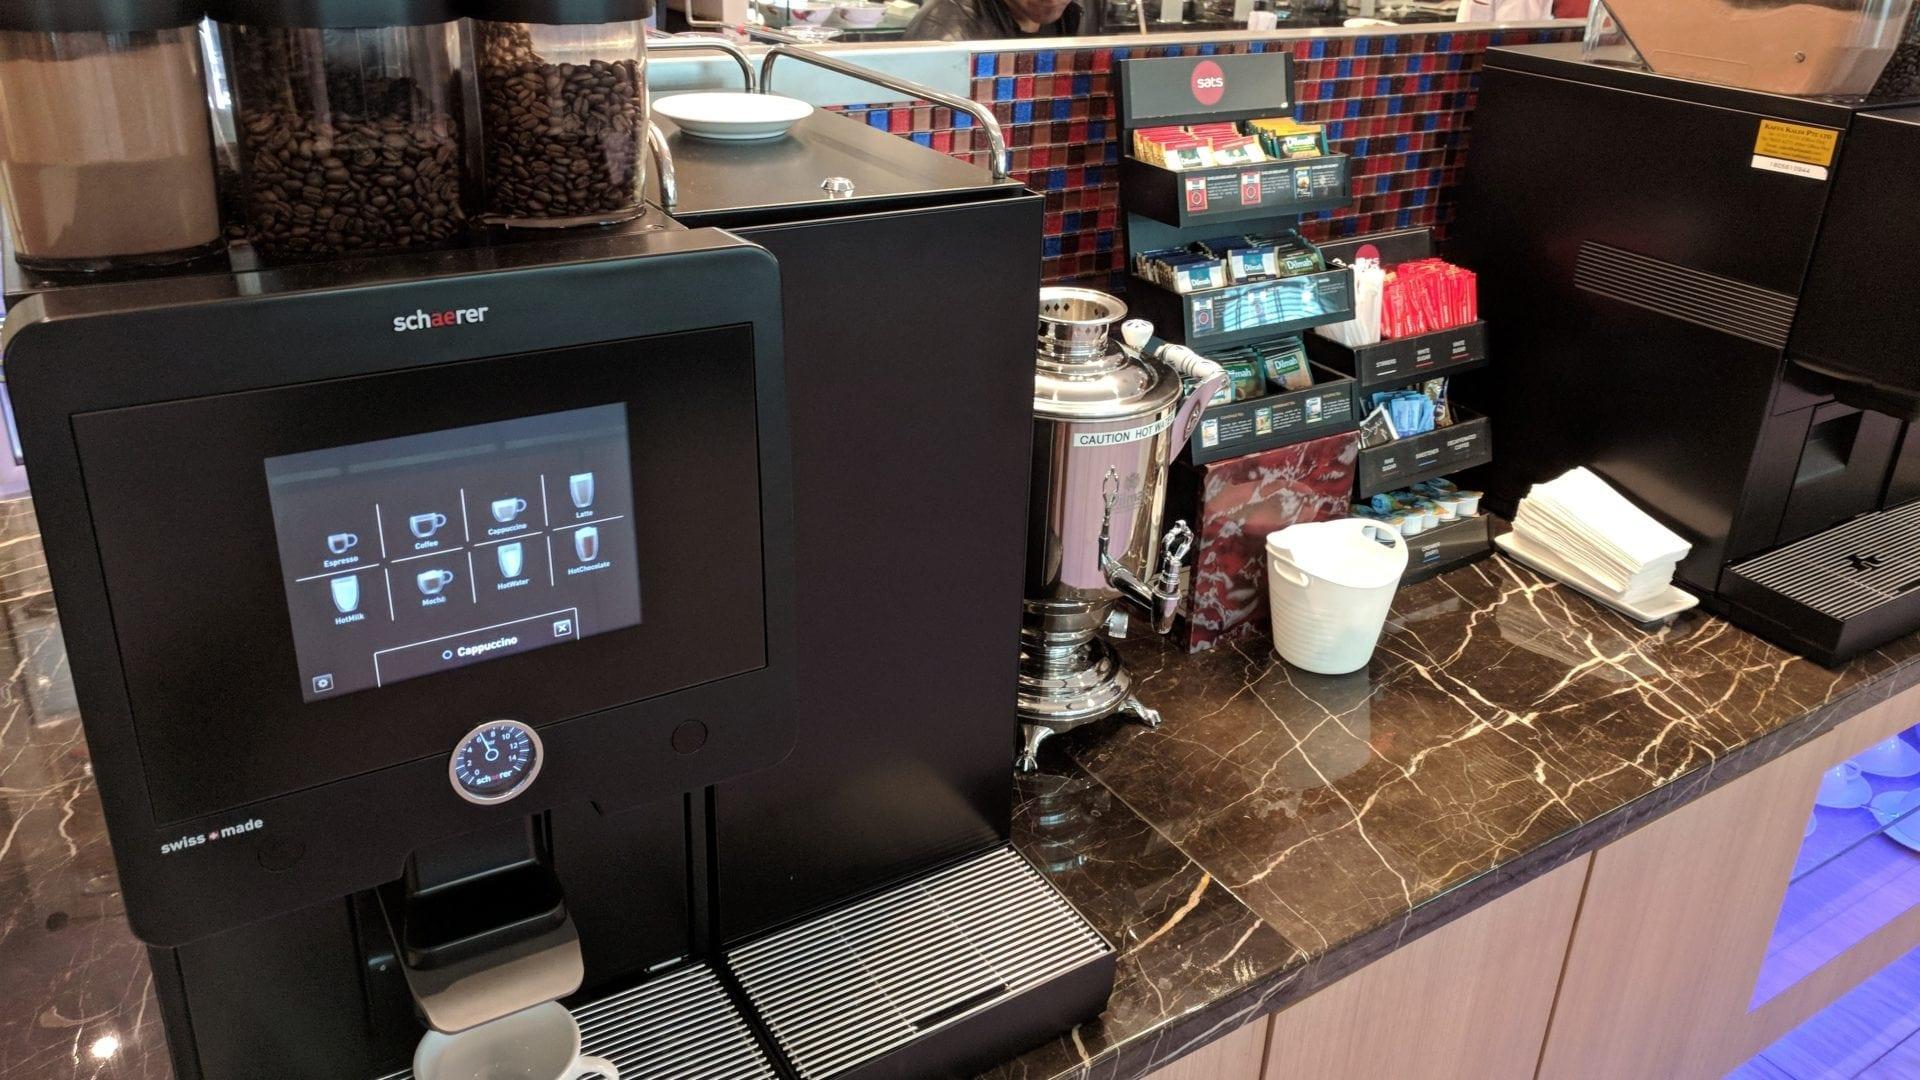 SATS Premier Lounge Singapur Kaffeemaschine